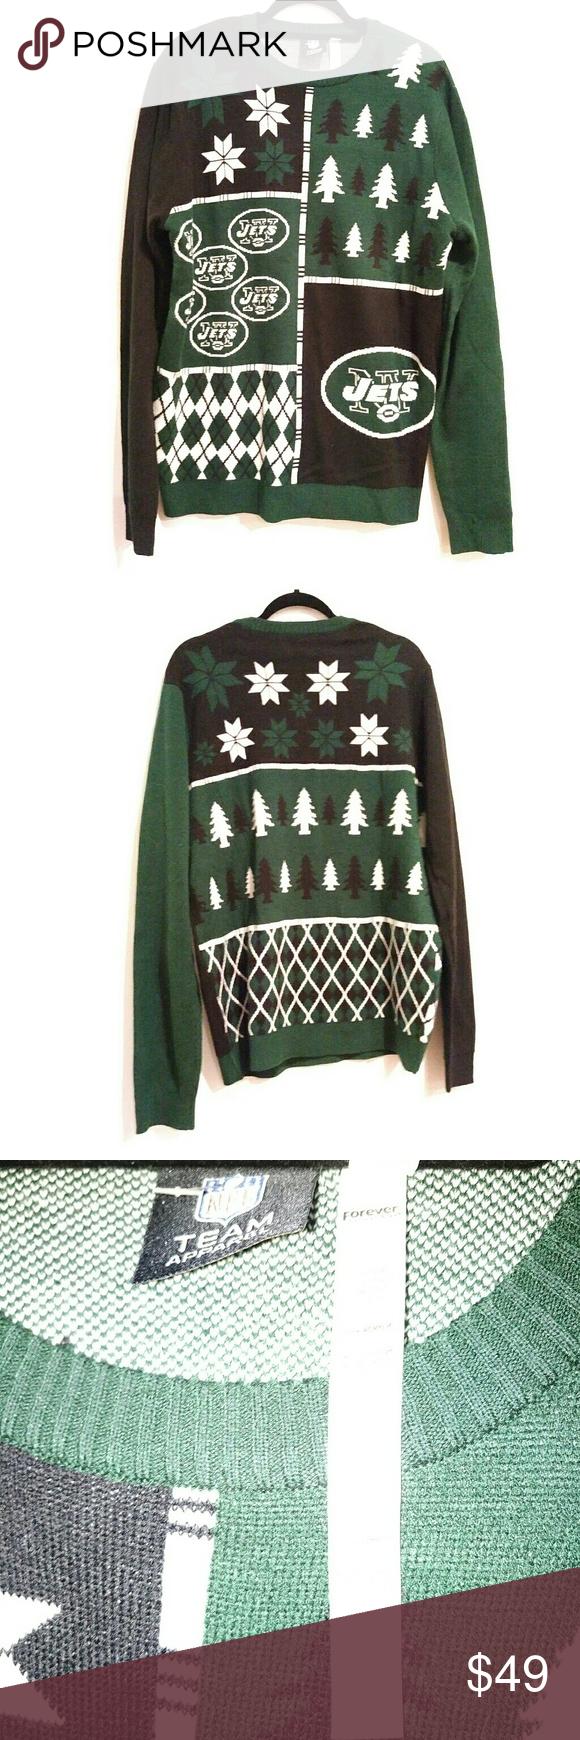 Jets ugly xmas sweater xl mens gary v   My Posh Picks   Pinterest ...